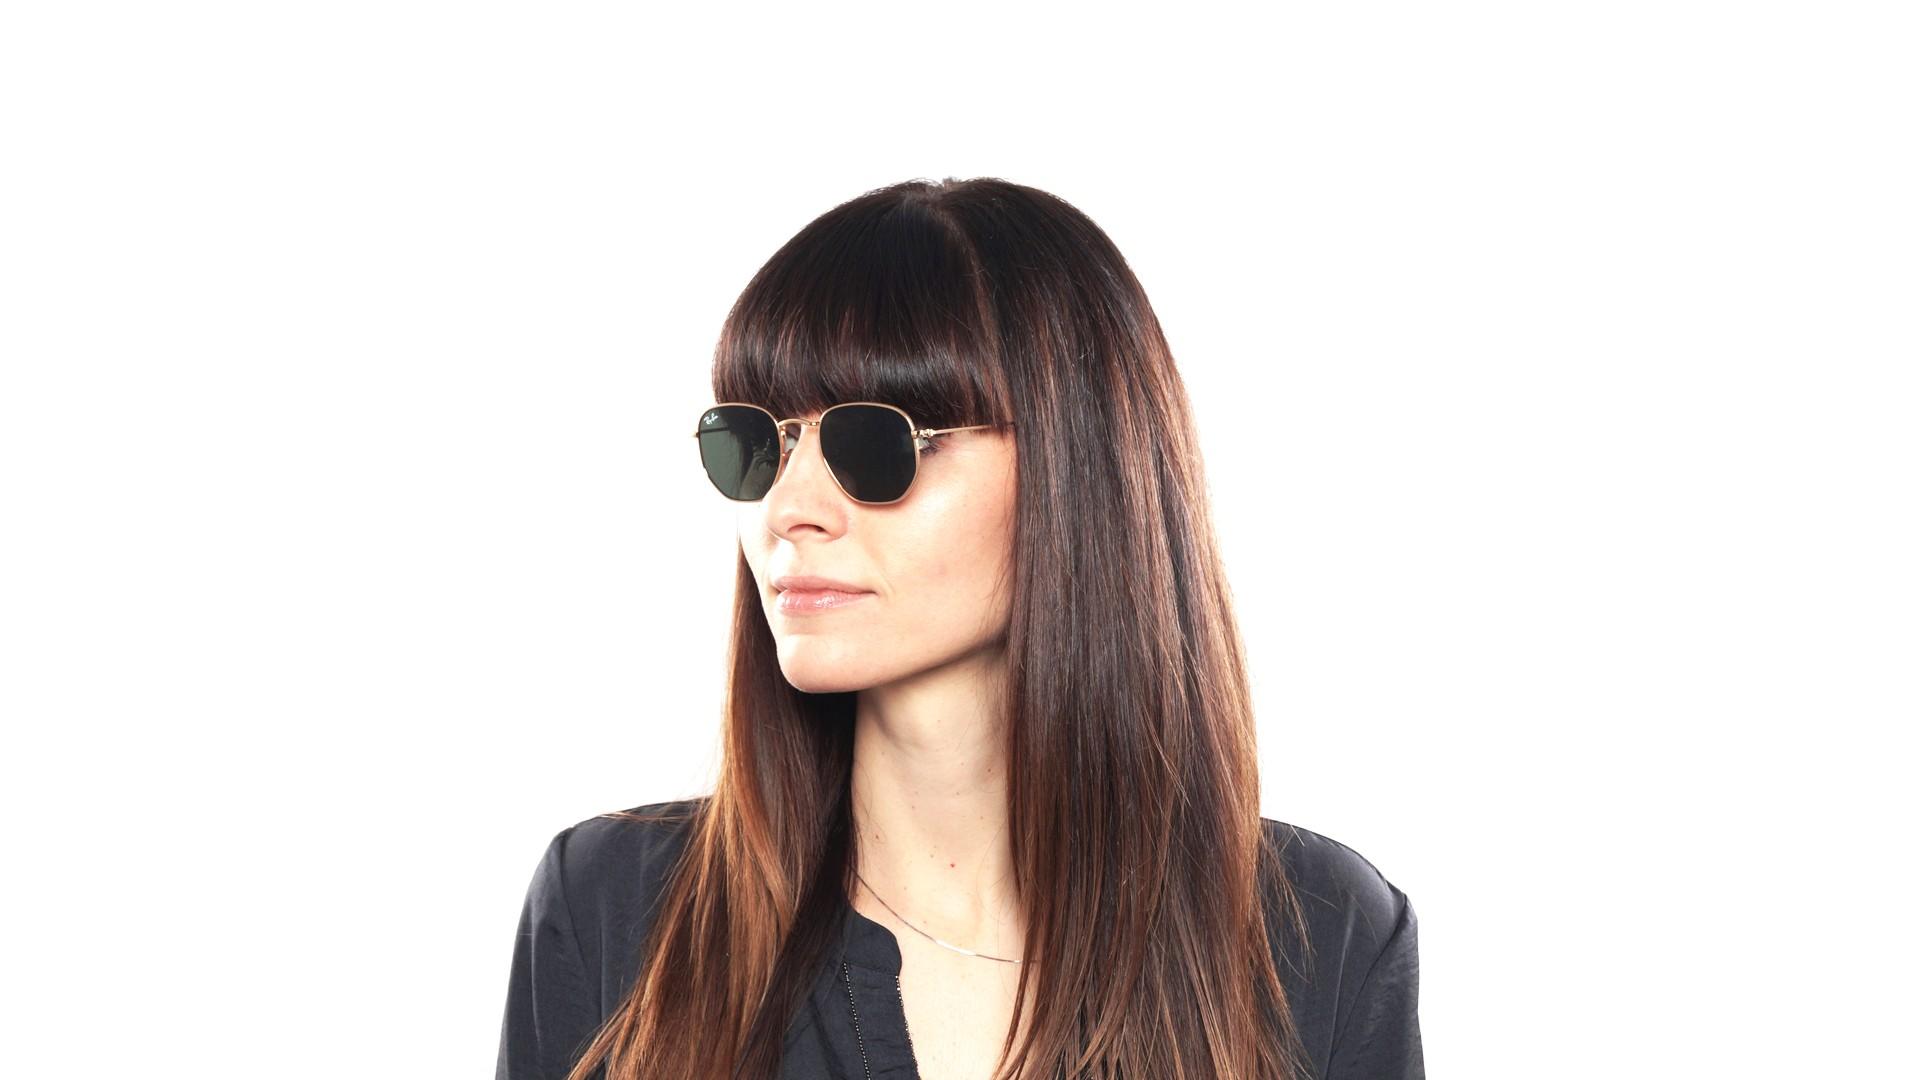 d0b0eecf62ef9 Sunglasses Ray-Ban RB3548N 001 48-21 Gold Small Flash